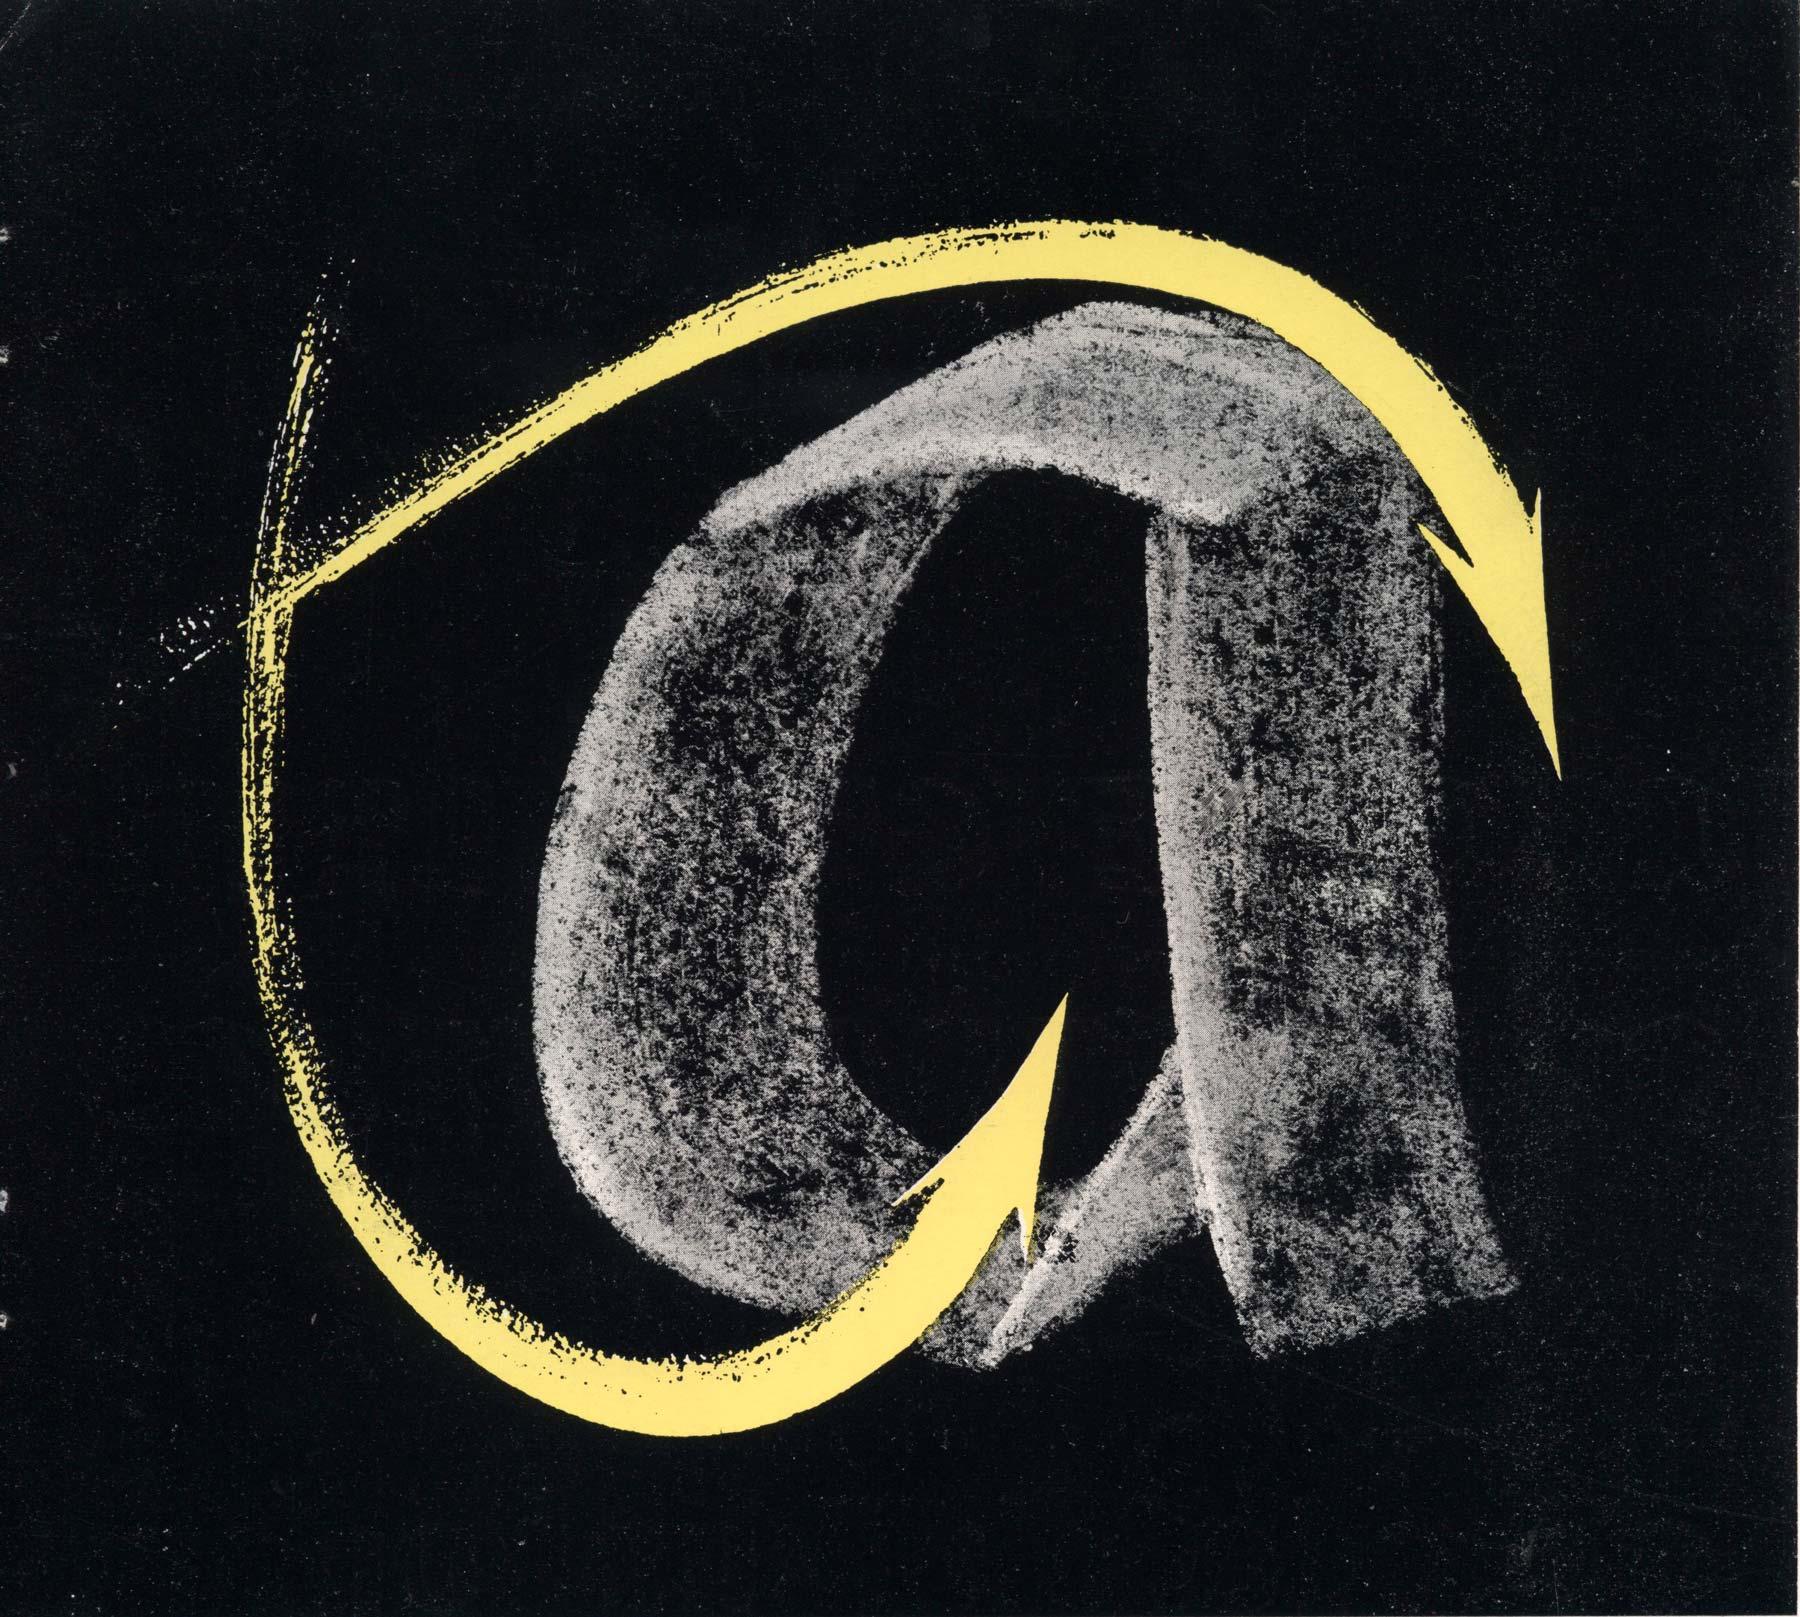 Jacno, graphiste et typographe populaire